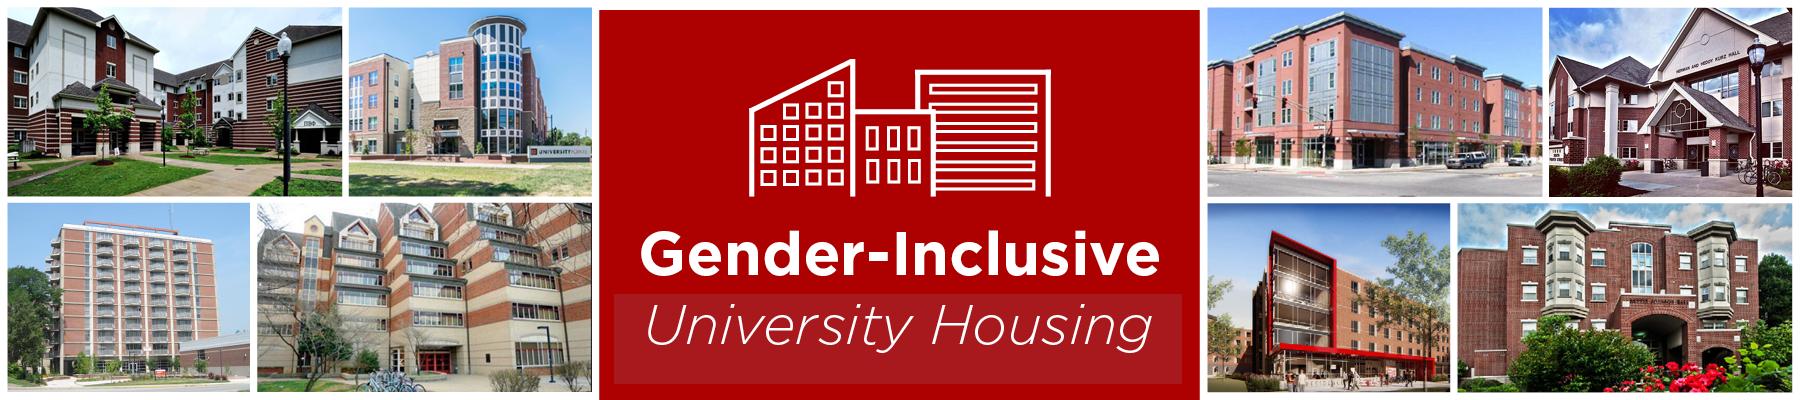 gender-inclusive housing